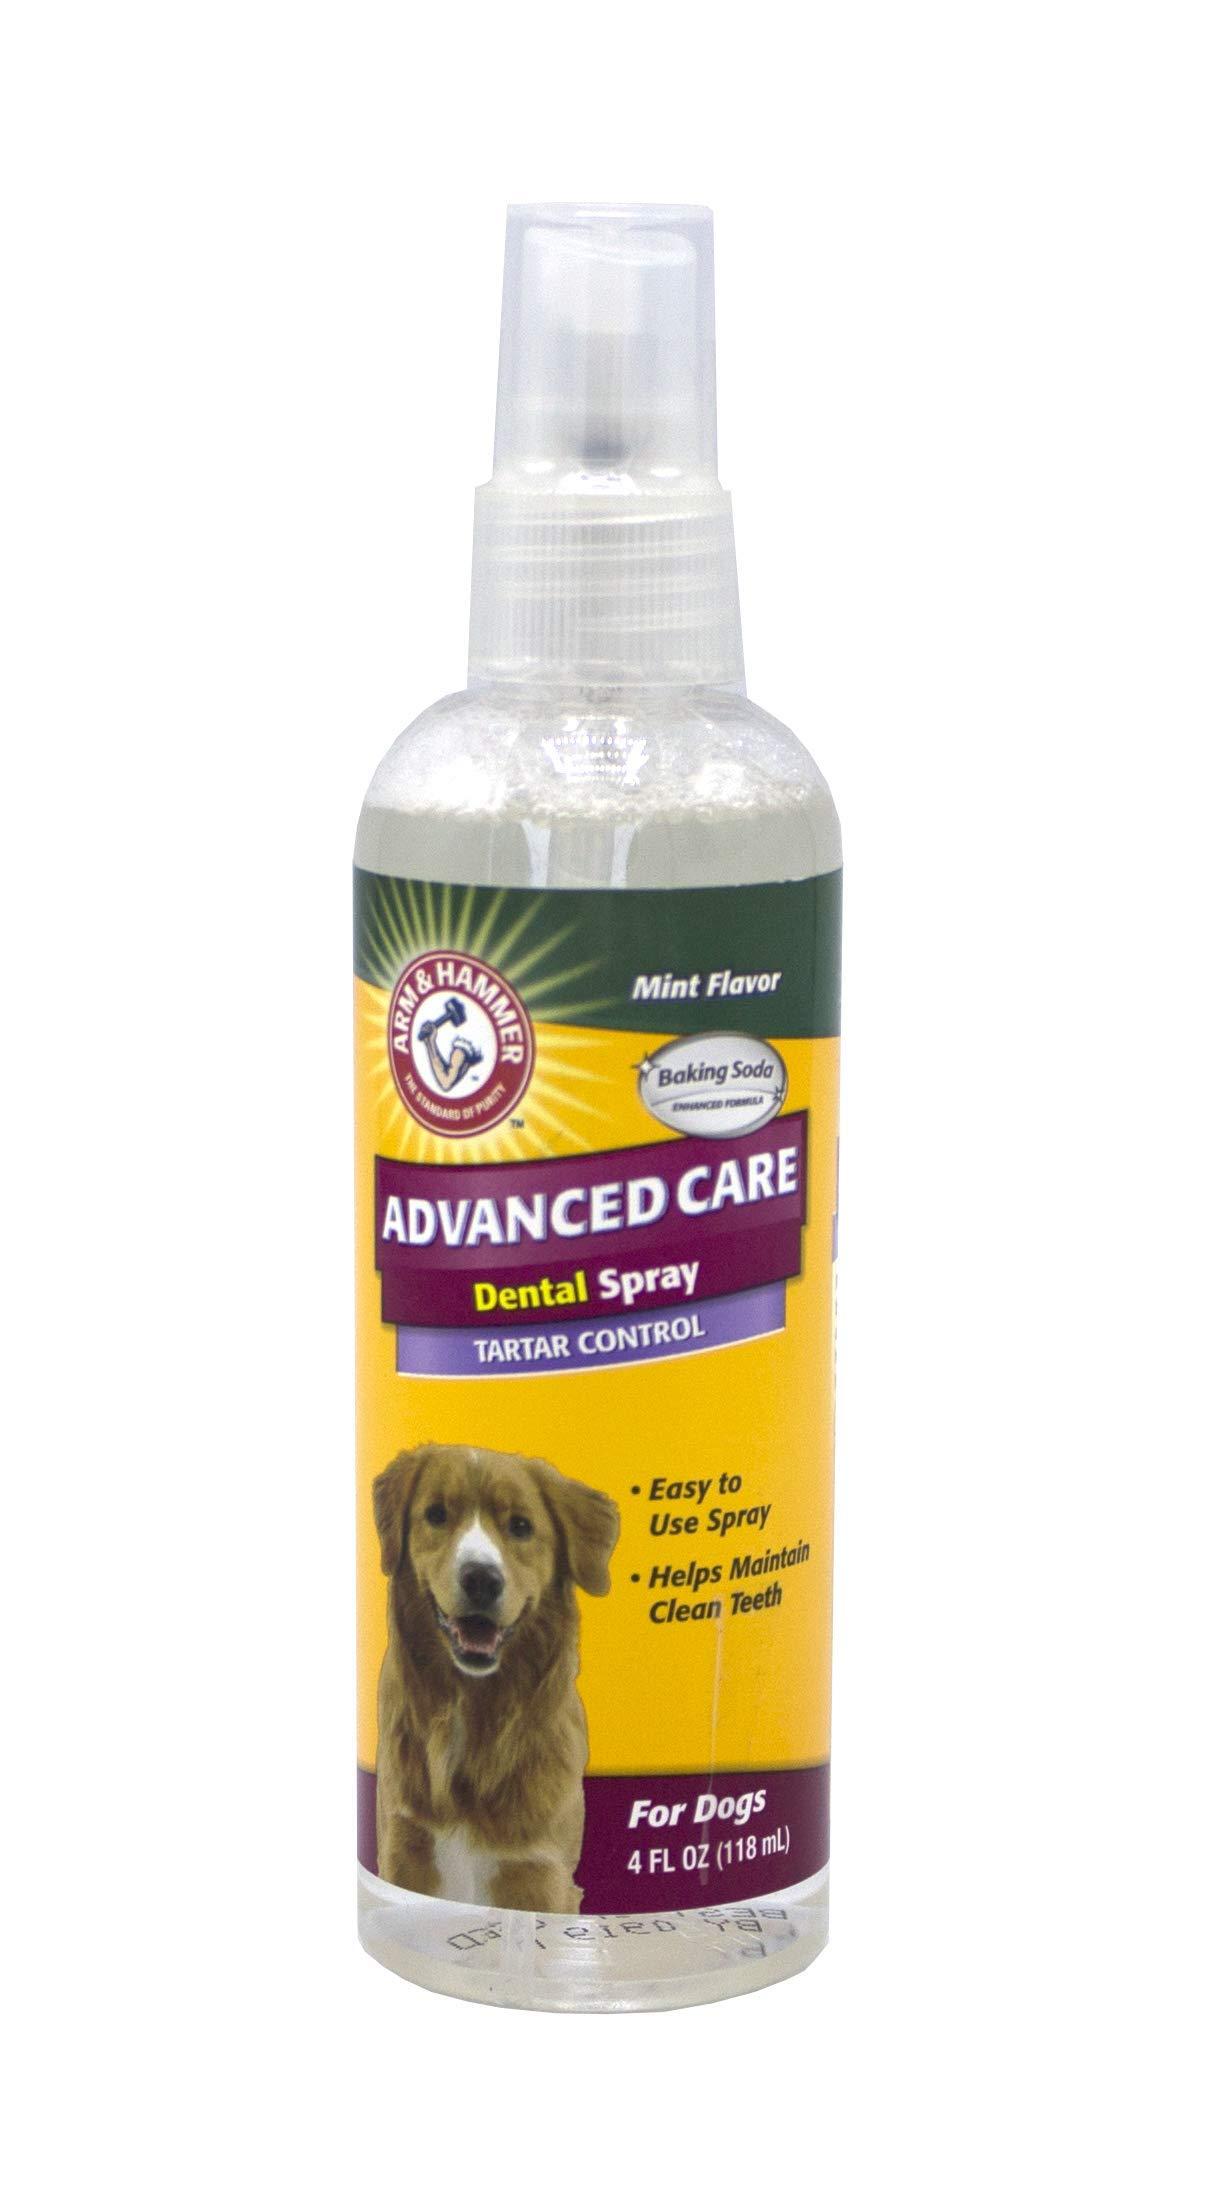 Arm & Hammer Dog Dental Care Tartar Control Dental Spray for Dogs | Reduces Plaque & Tartar Buildup Without Brushing | Mint Flavor, 4 Ounces